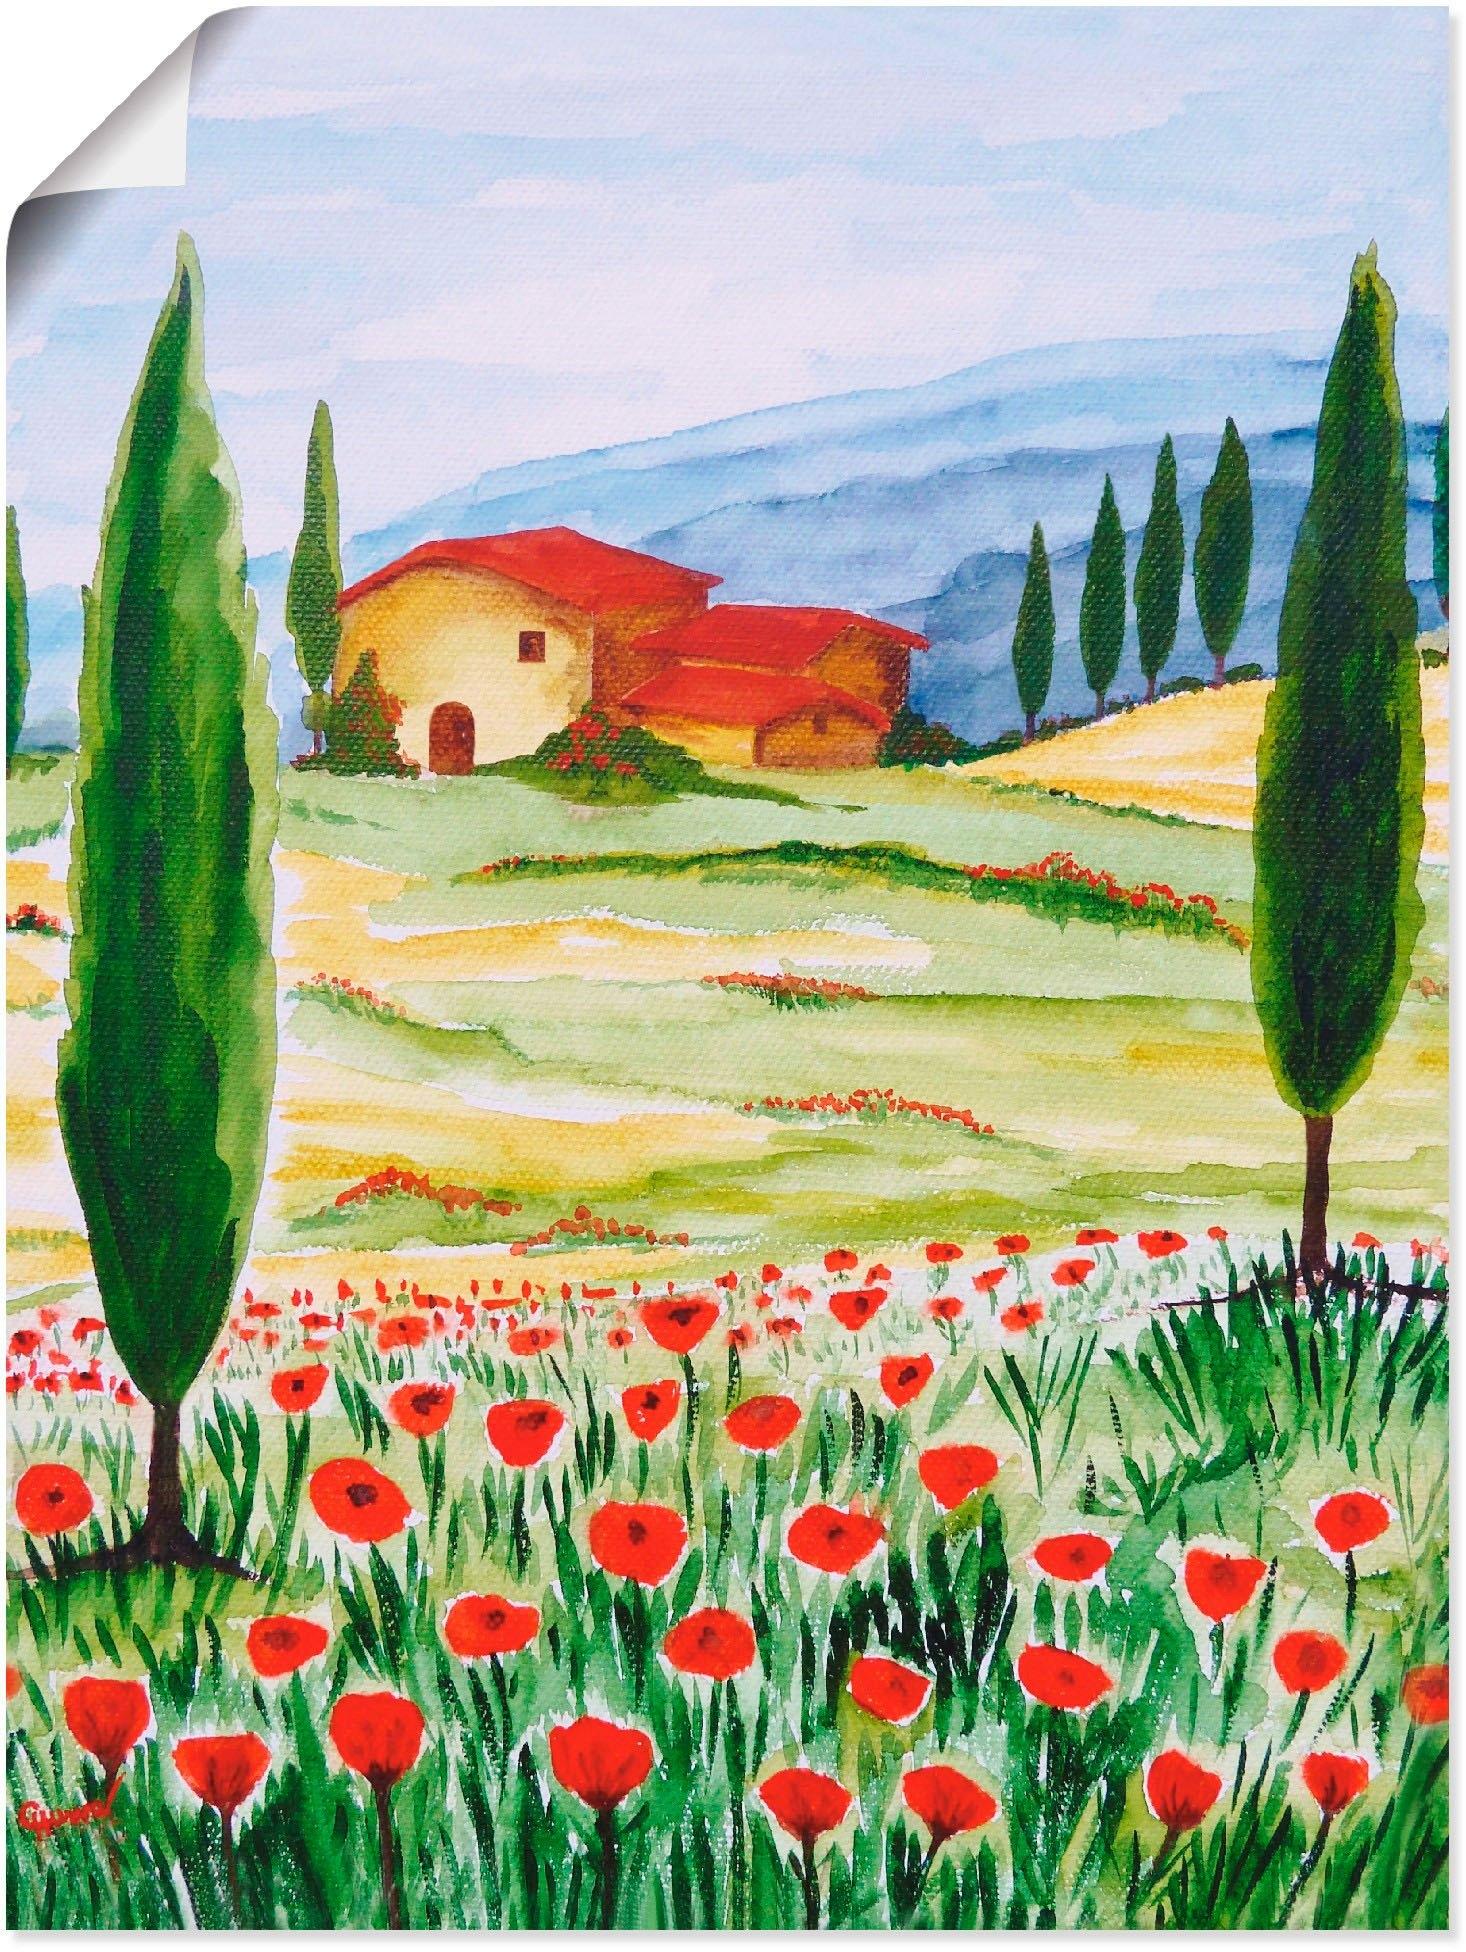 Artland artprint »Blühender Mohn in der Toskana« bij OTTO online kopen